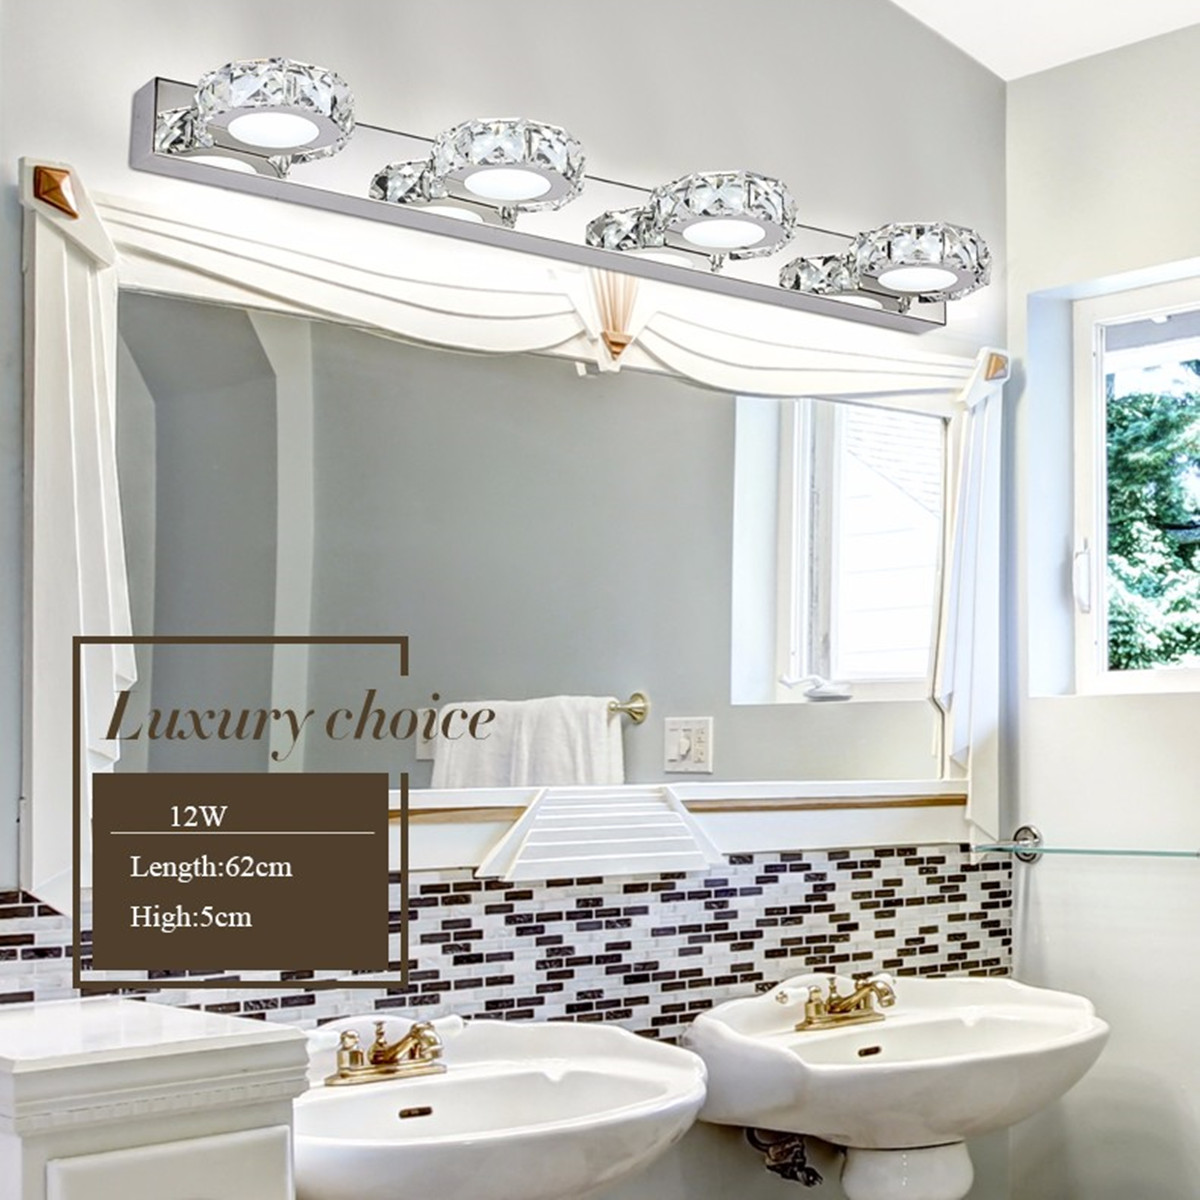 LED Crystal Bathroom Wall Lamp Modern Noble Design High Efficiency Fixture Mirror Light Make up Vanity Ligh 3/4 Head Energy Save серьги коюз топаз серьги т142026393